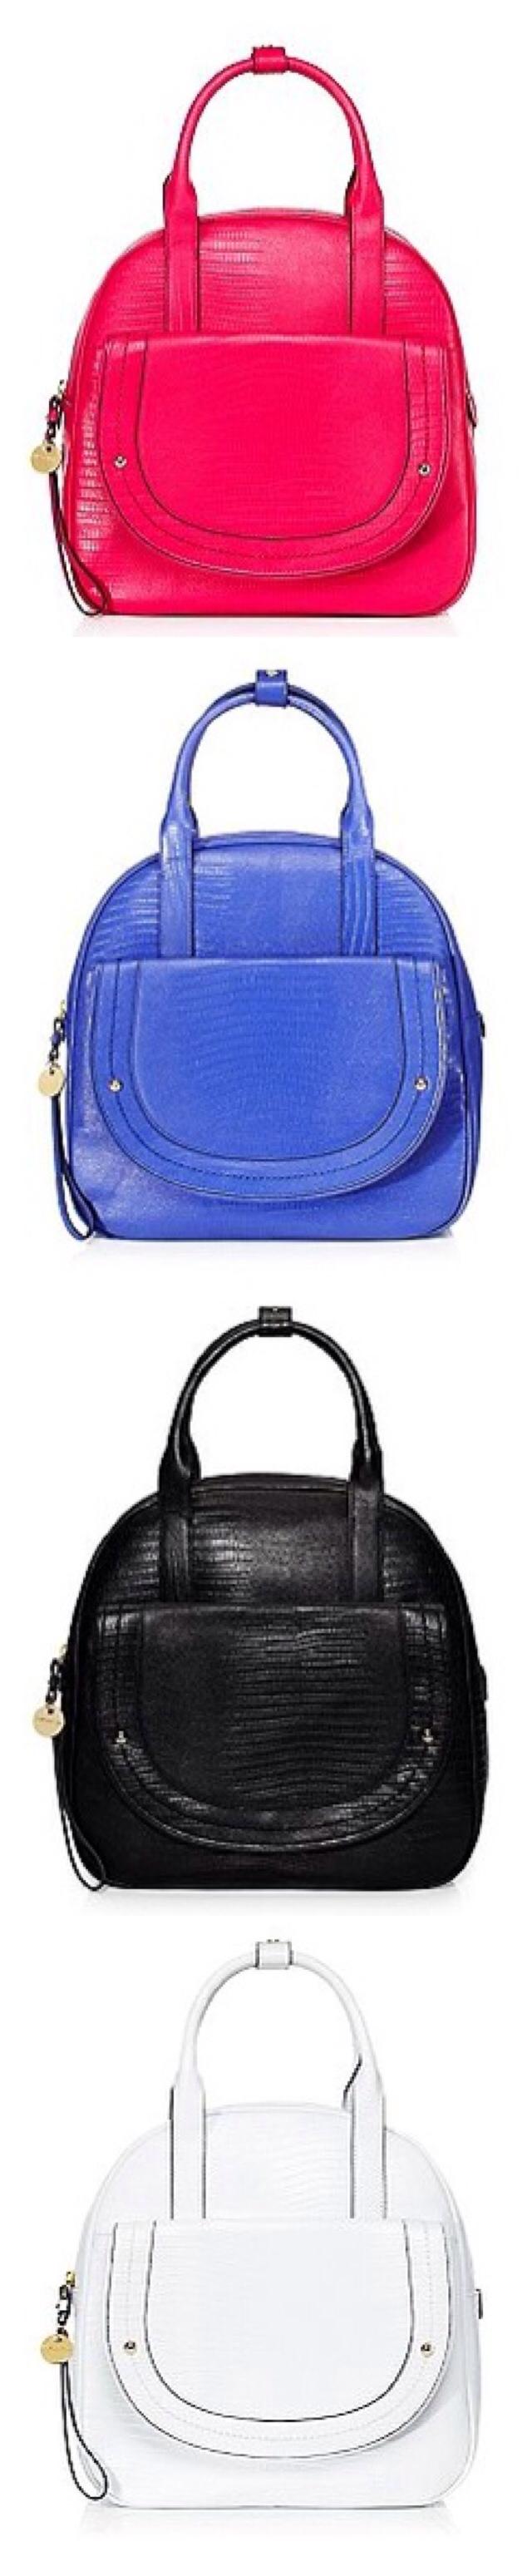 Luxury Designer Bags-Juicy Couture⭐️